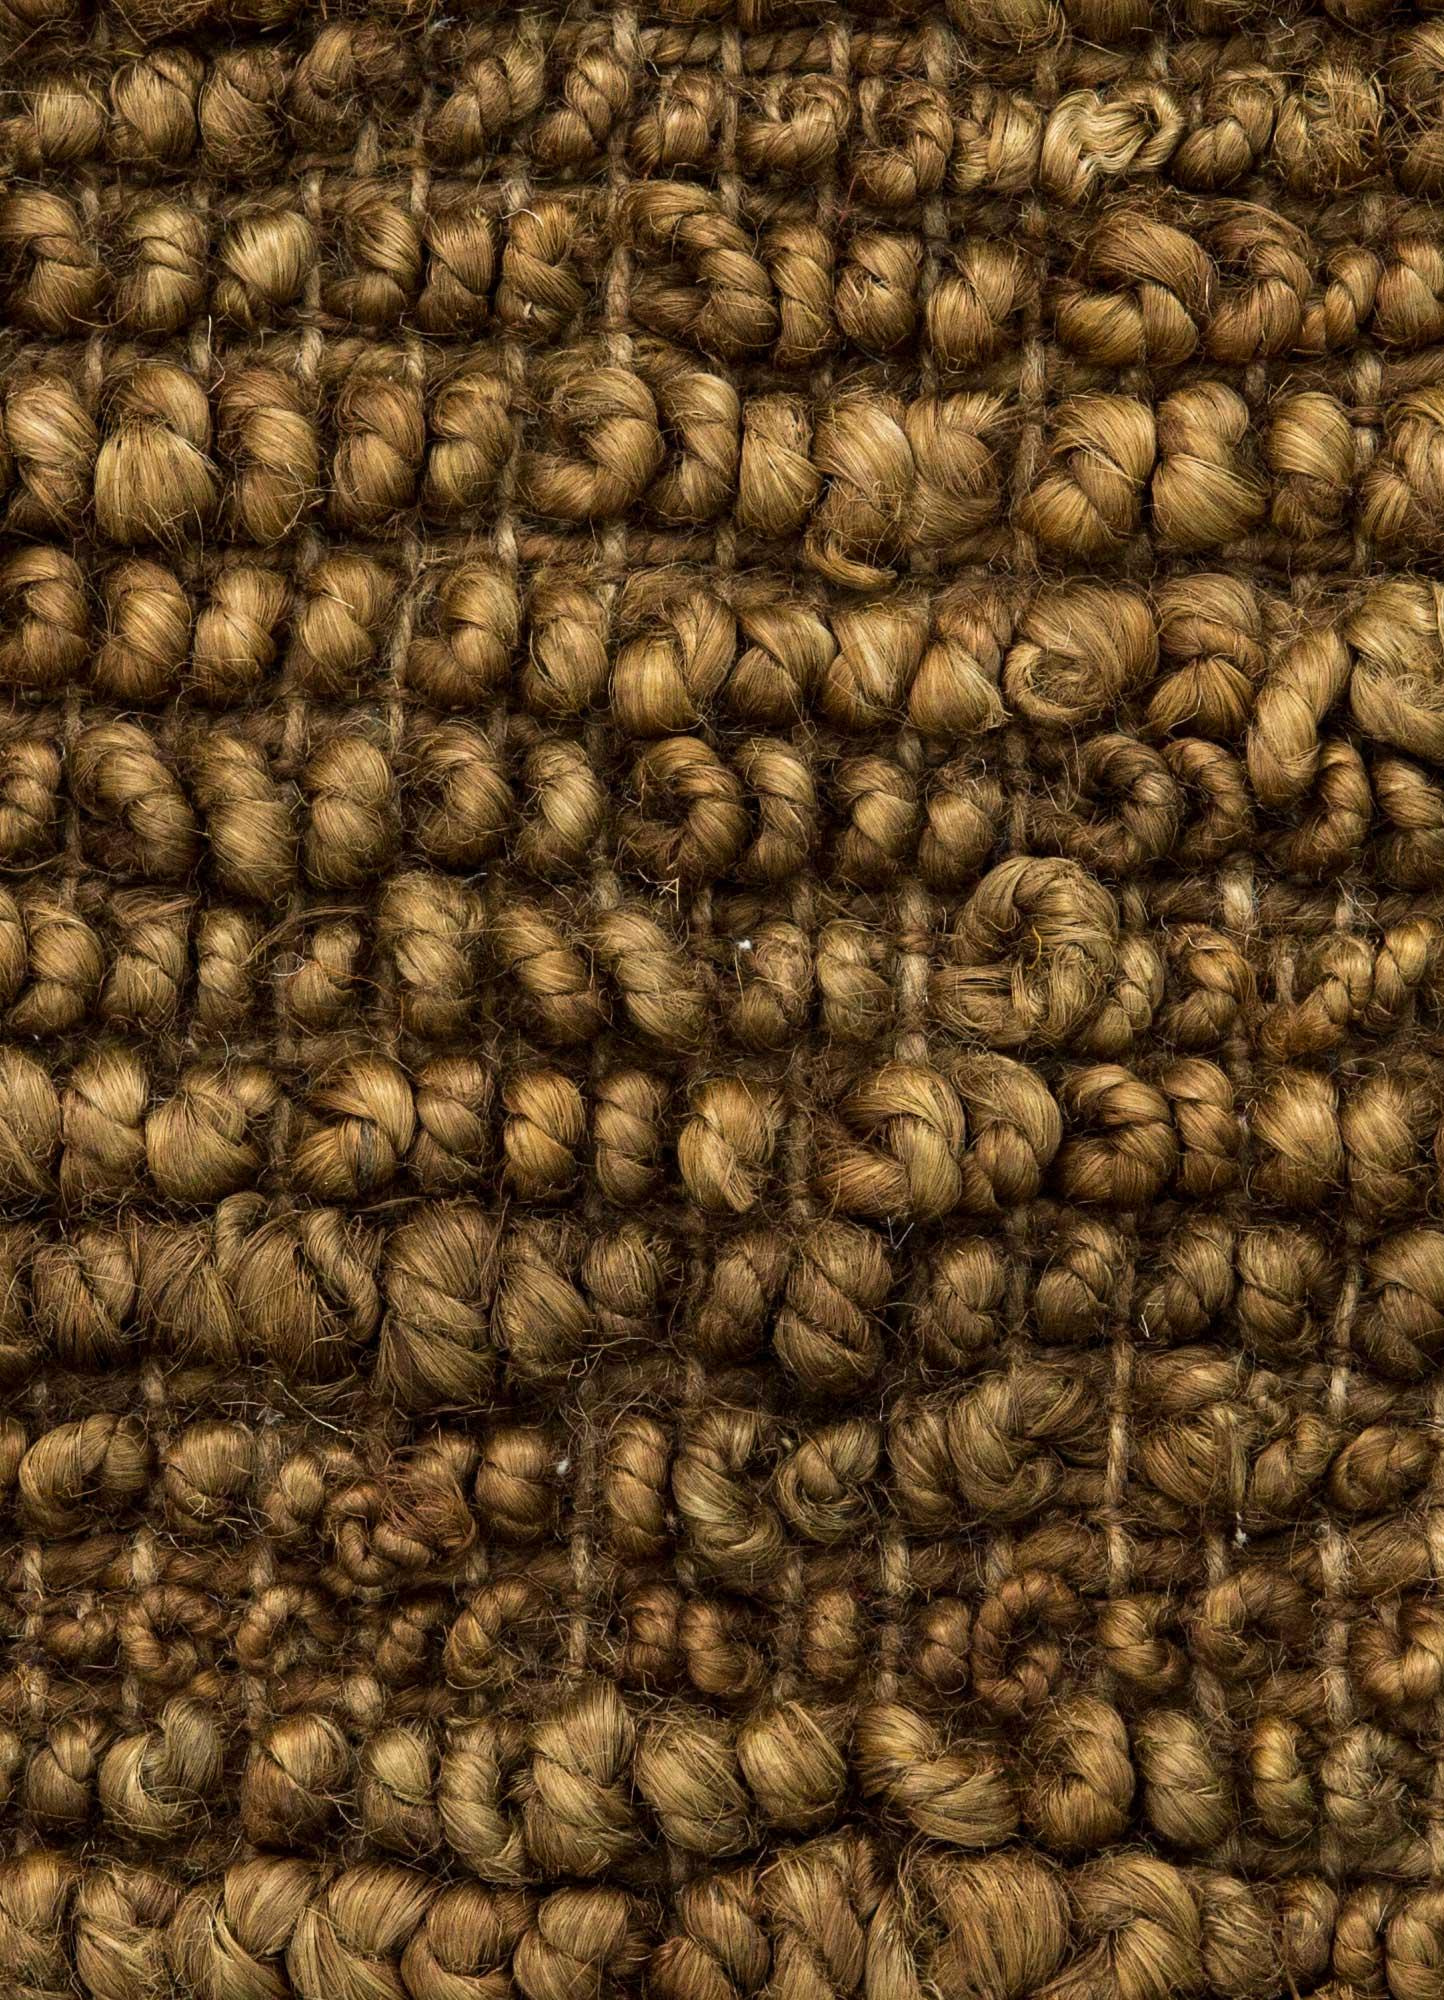 abrash beige and brown jute and hemp flat weaves Rug - CloseUp